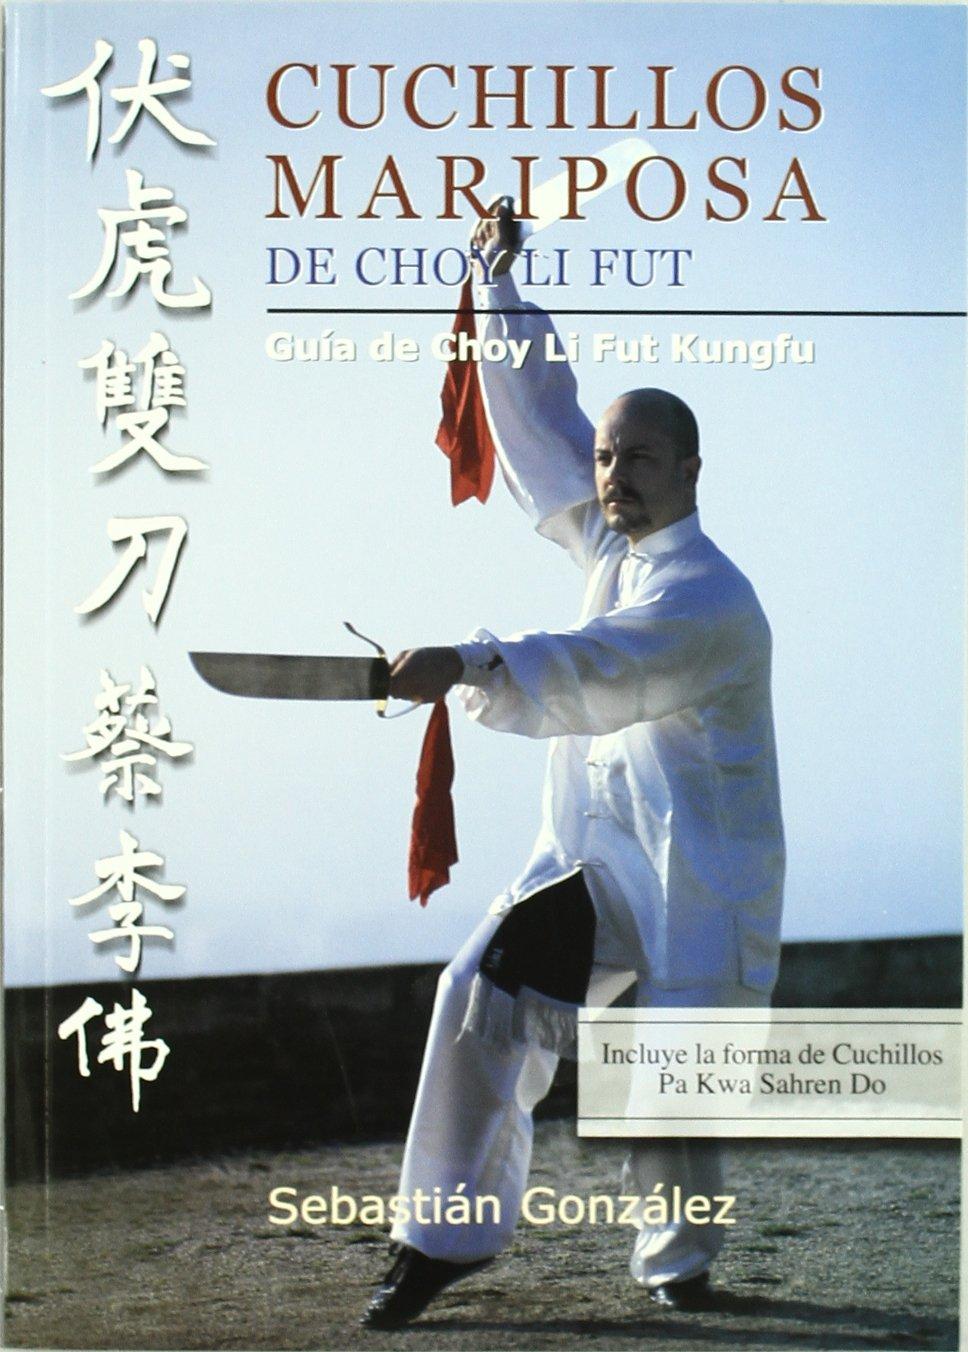 Cuchillos mariposa de Choy Li Fut : guía de Choy Li Fut ...